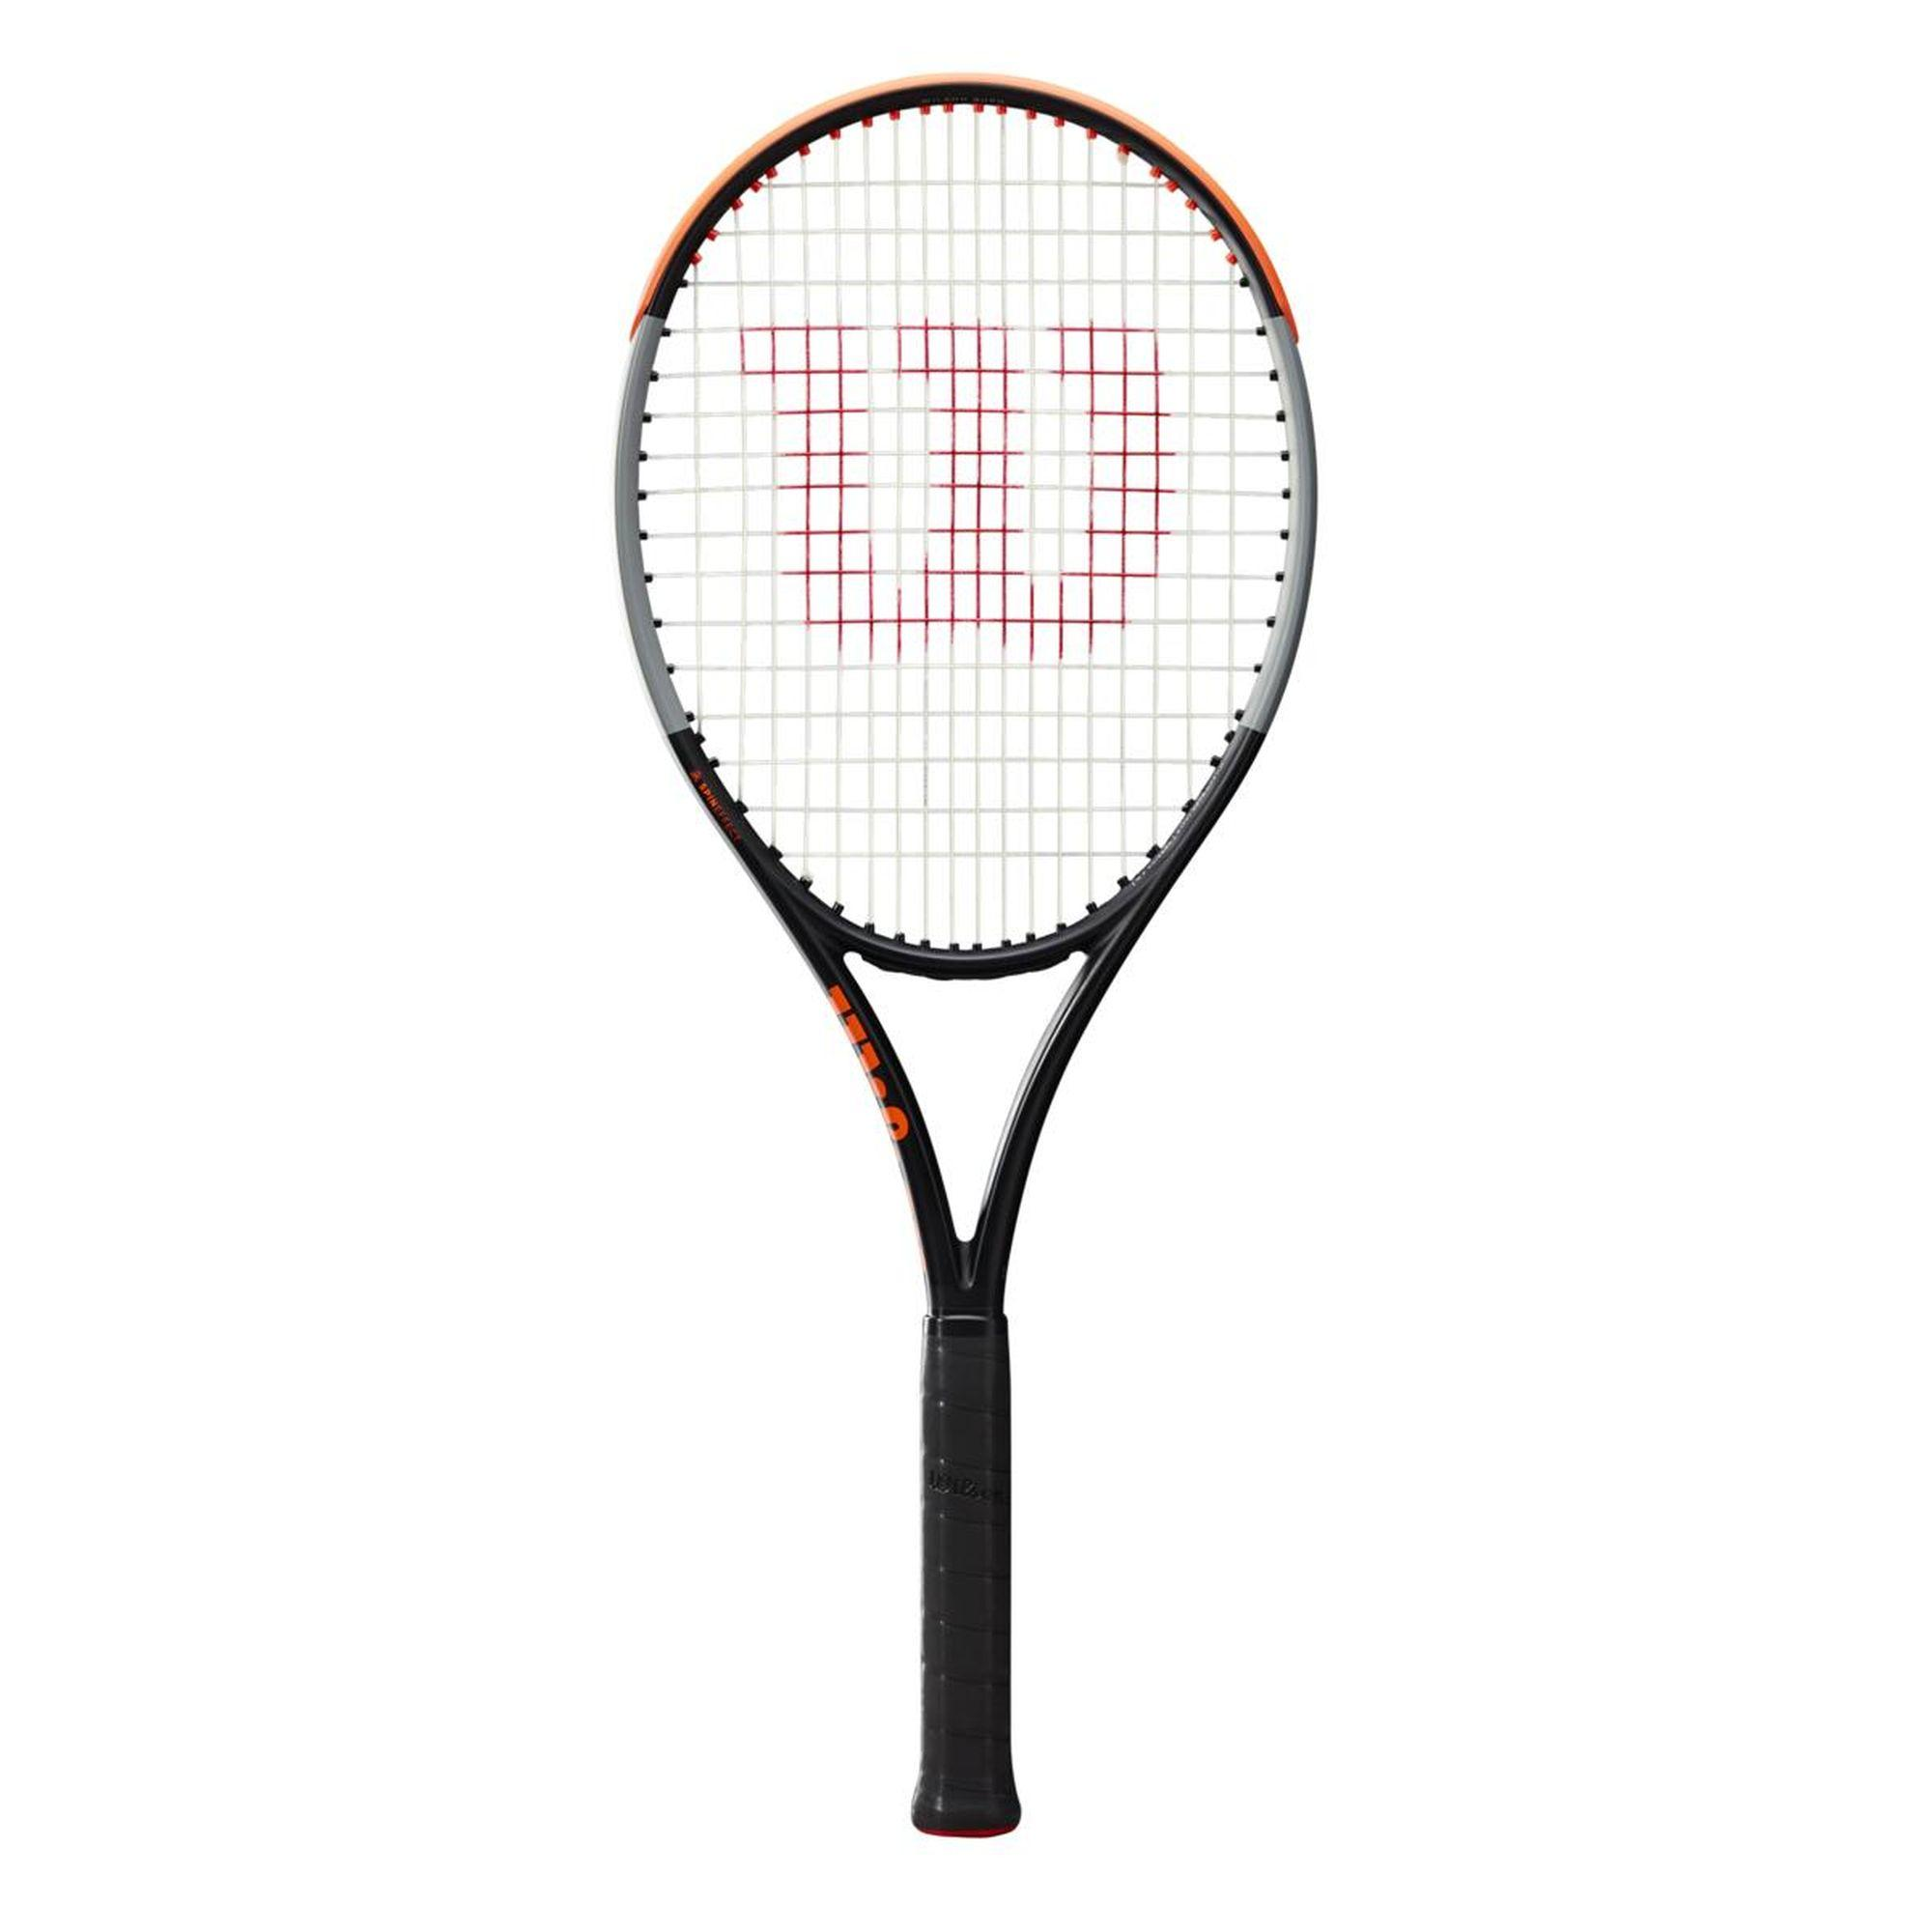 Rachetă Tenis BURN 100LS V4.0 la Reducere poza